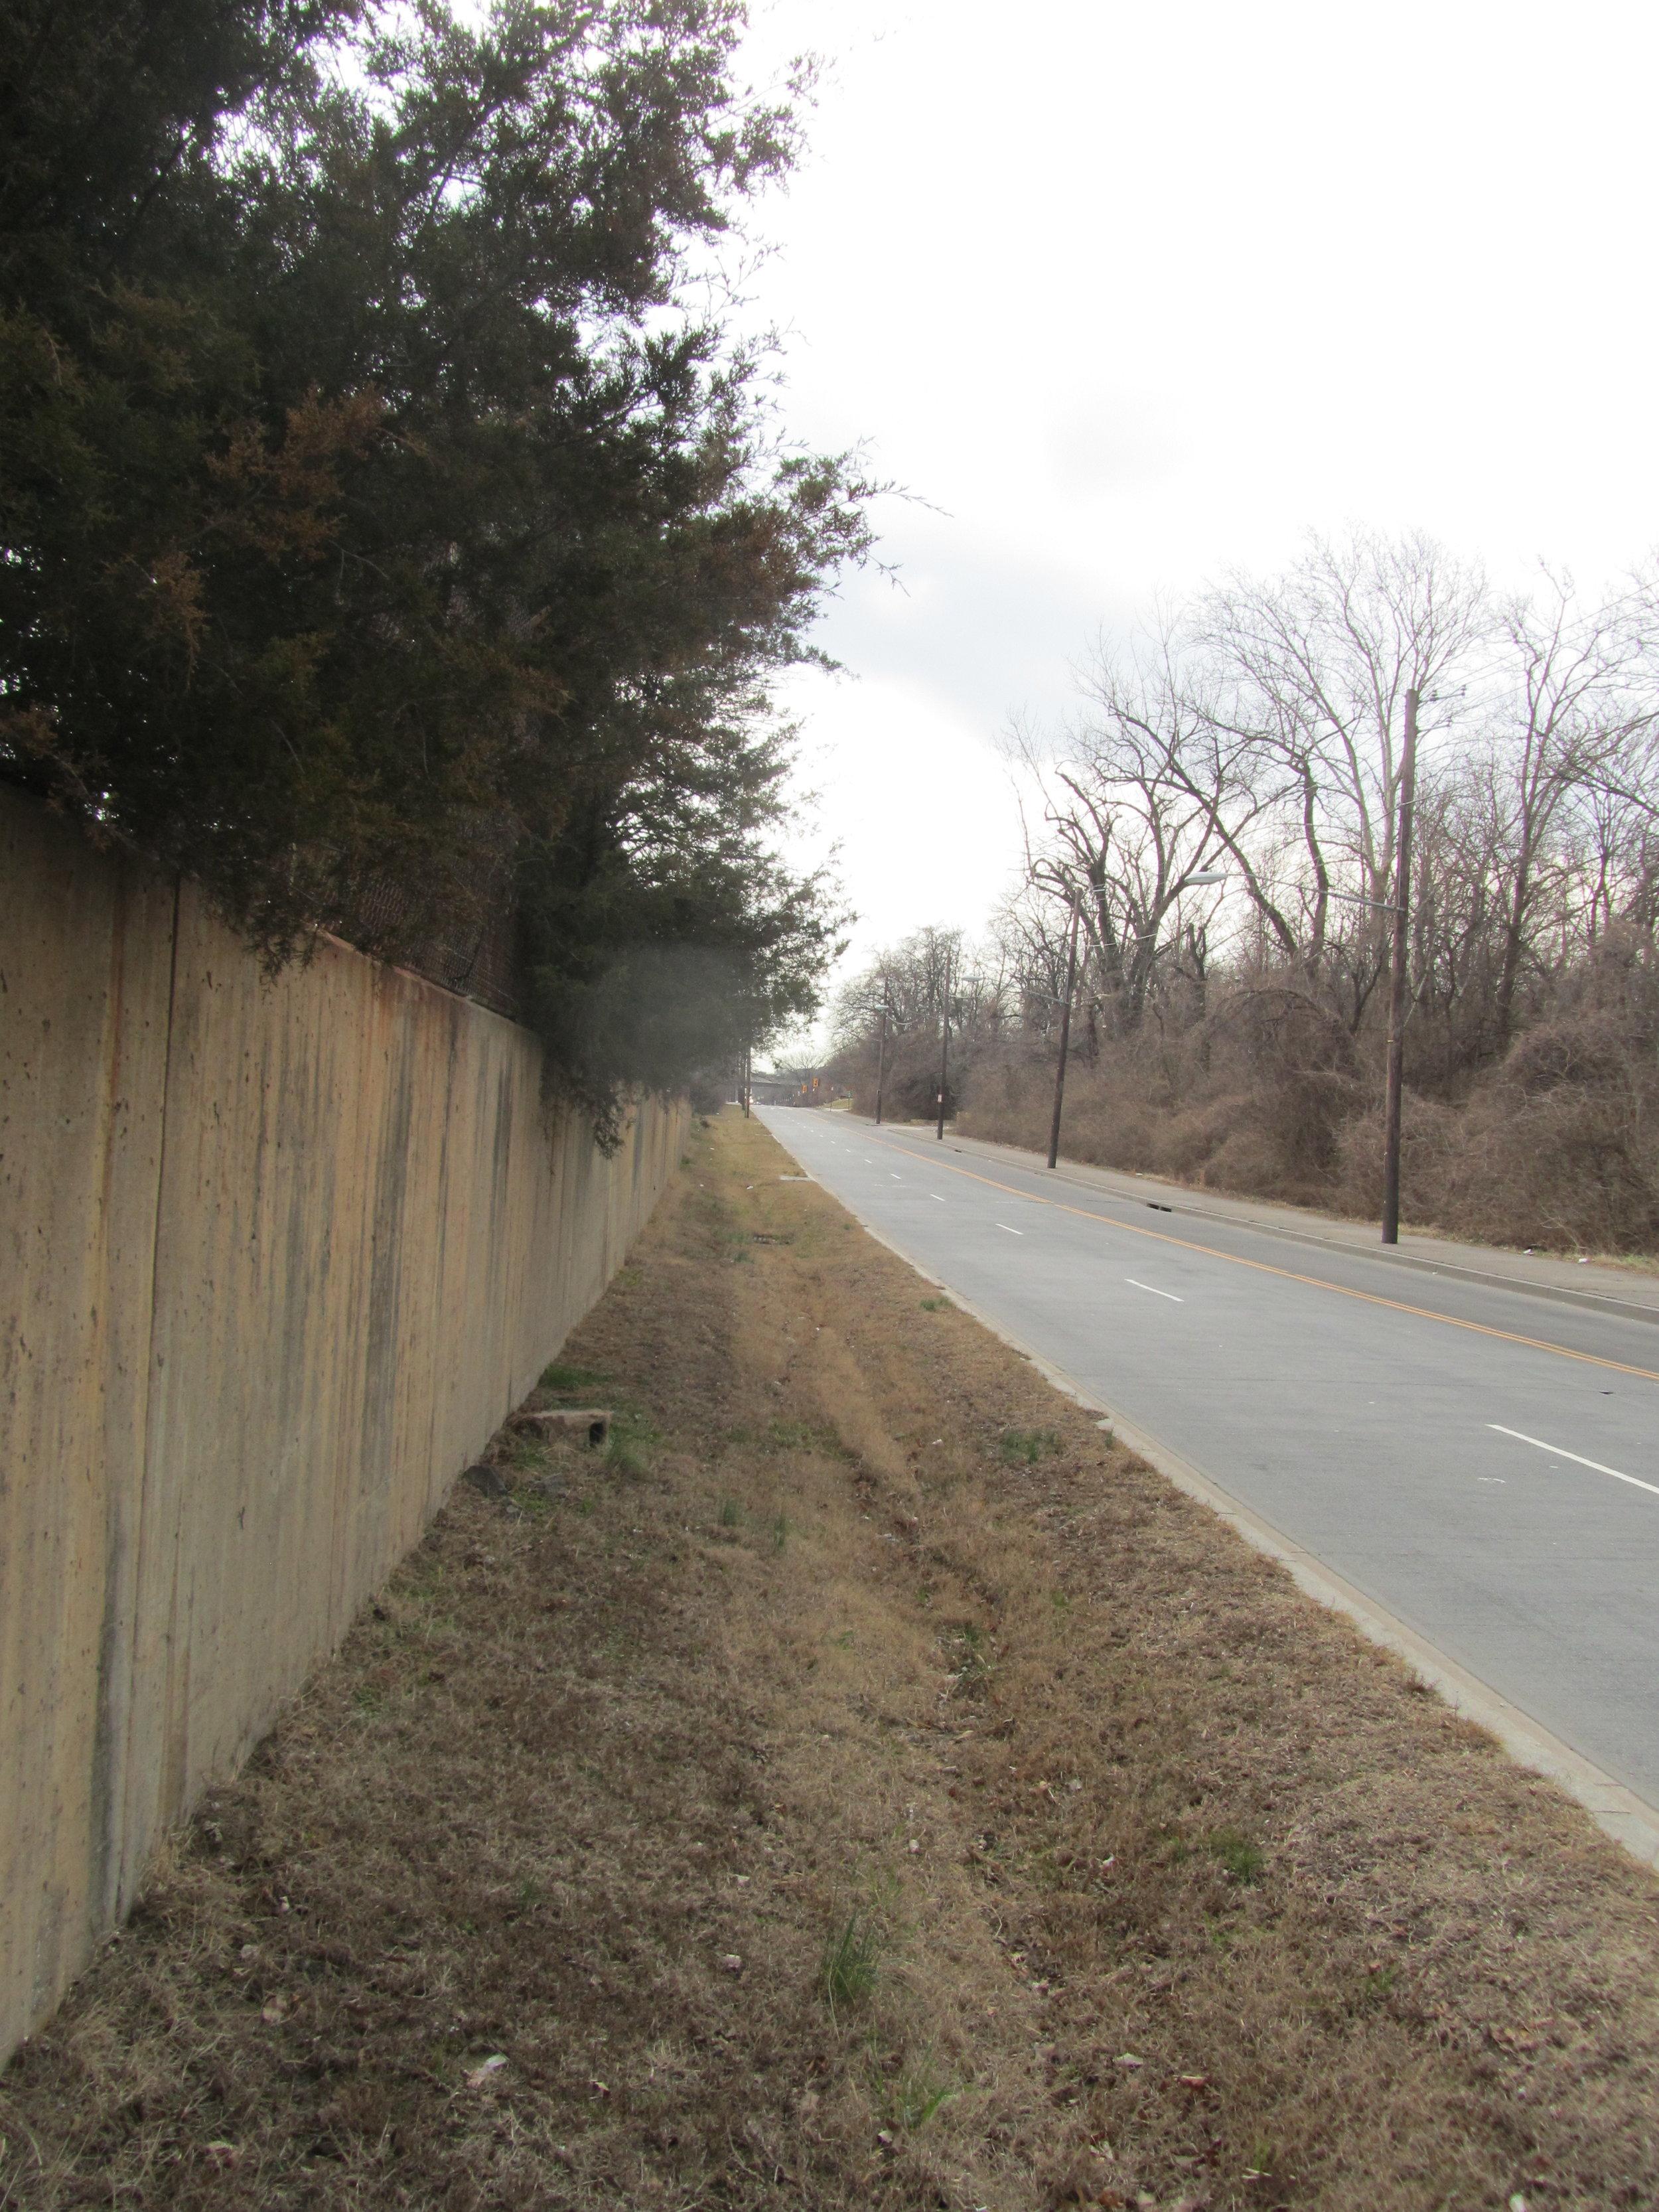 WMATA retaining wall